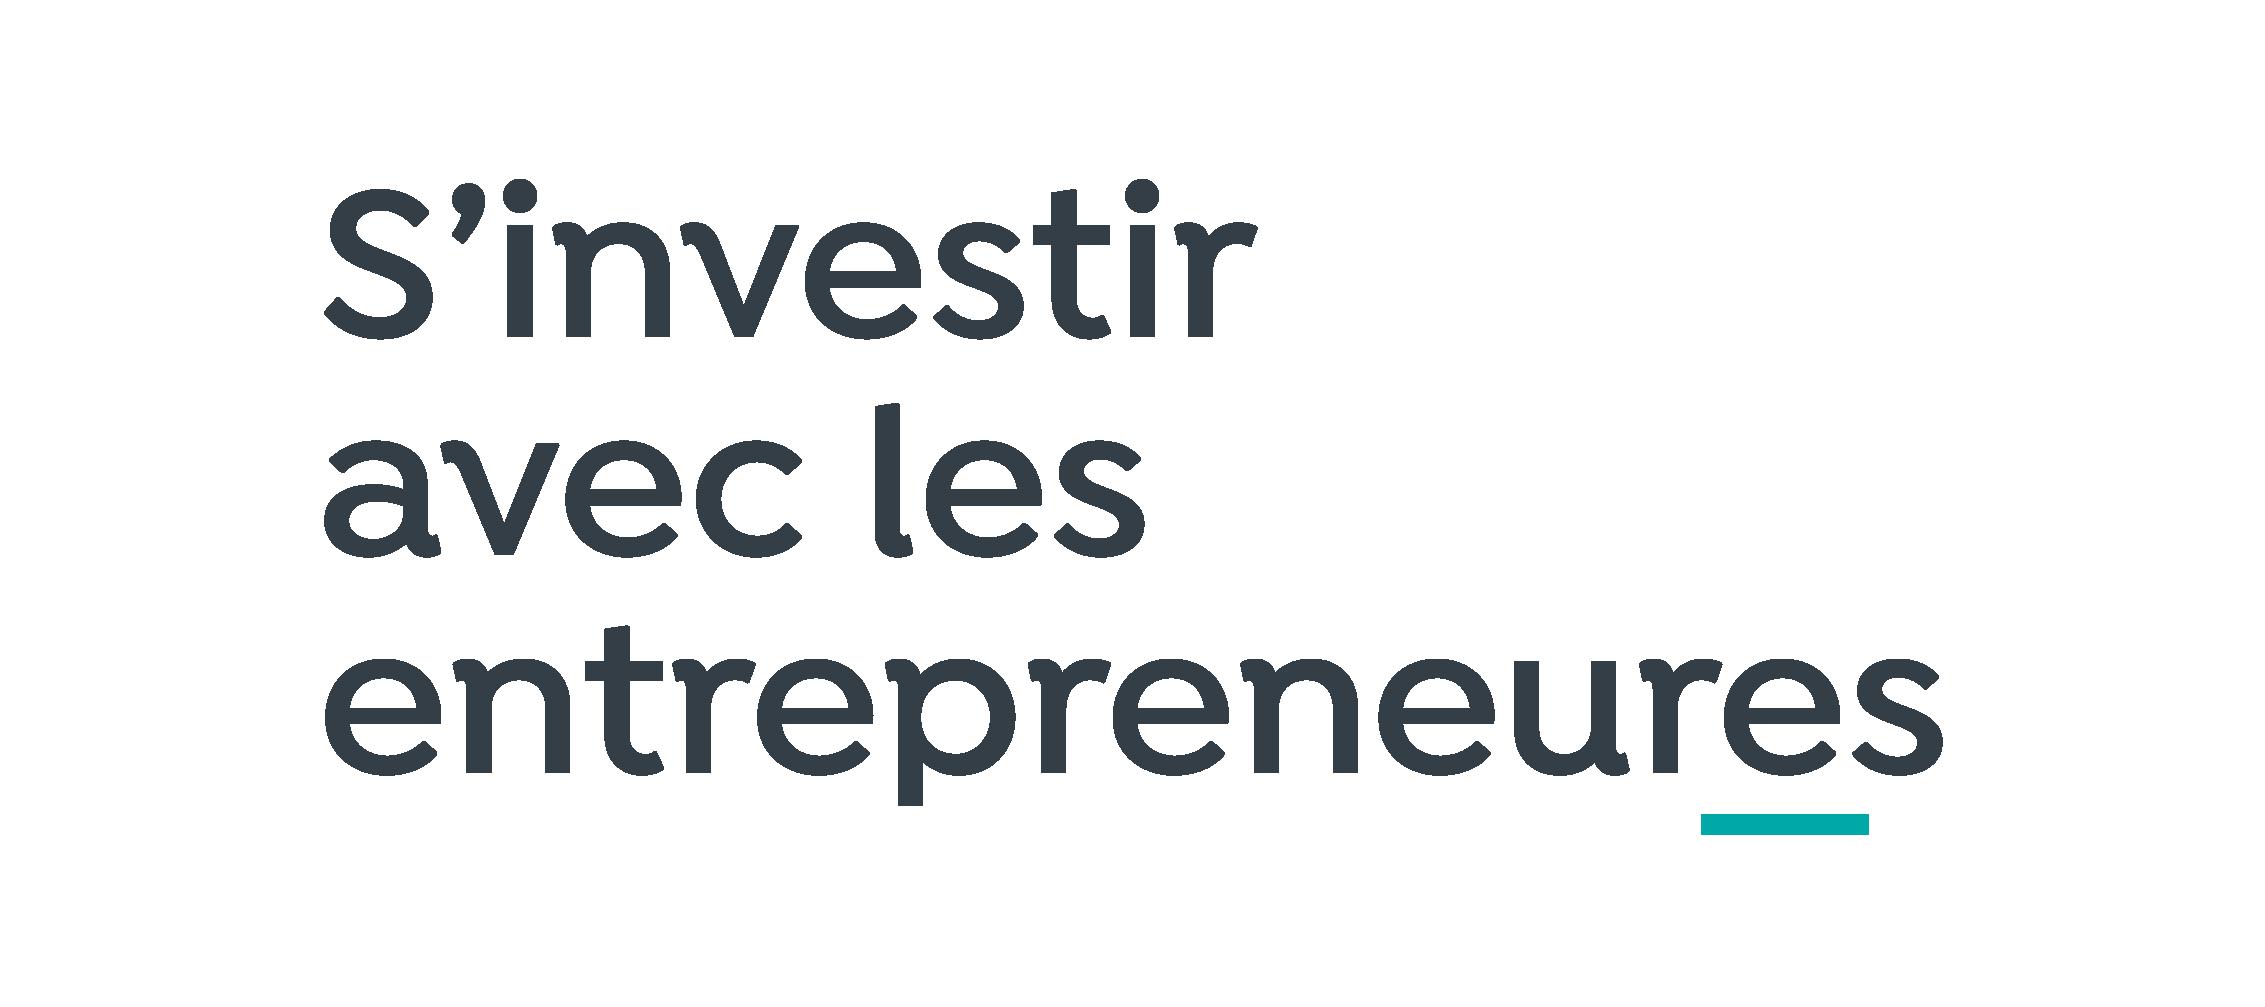 Logo Slogan S Investir Avec Entrepreneures